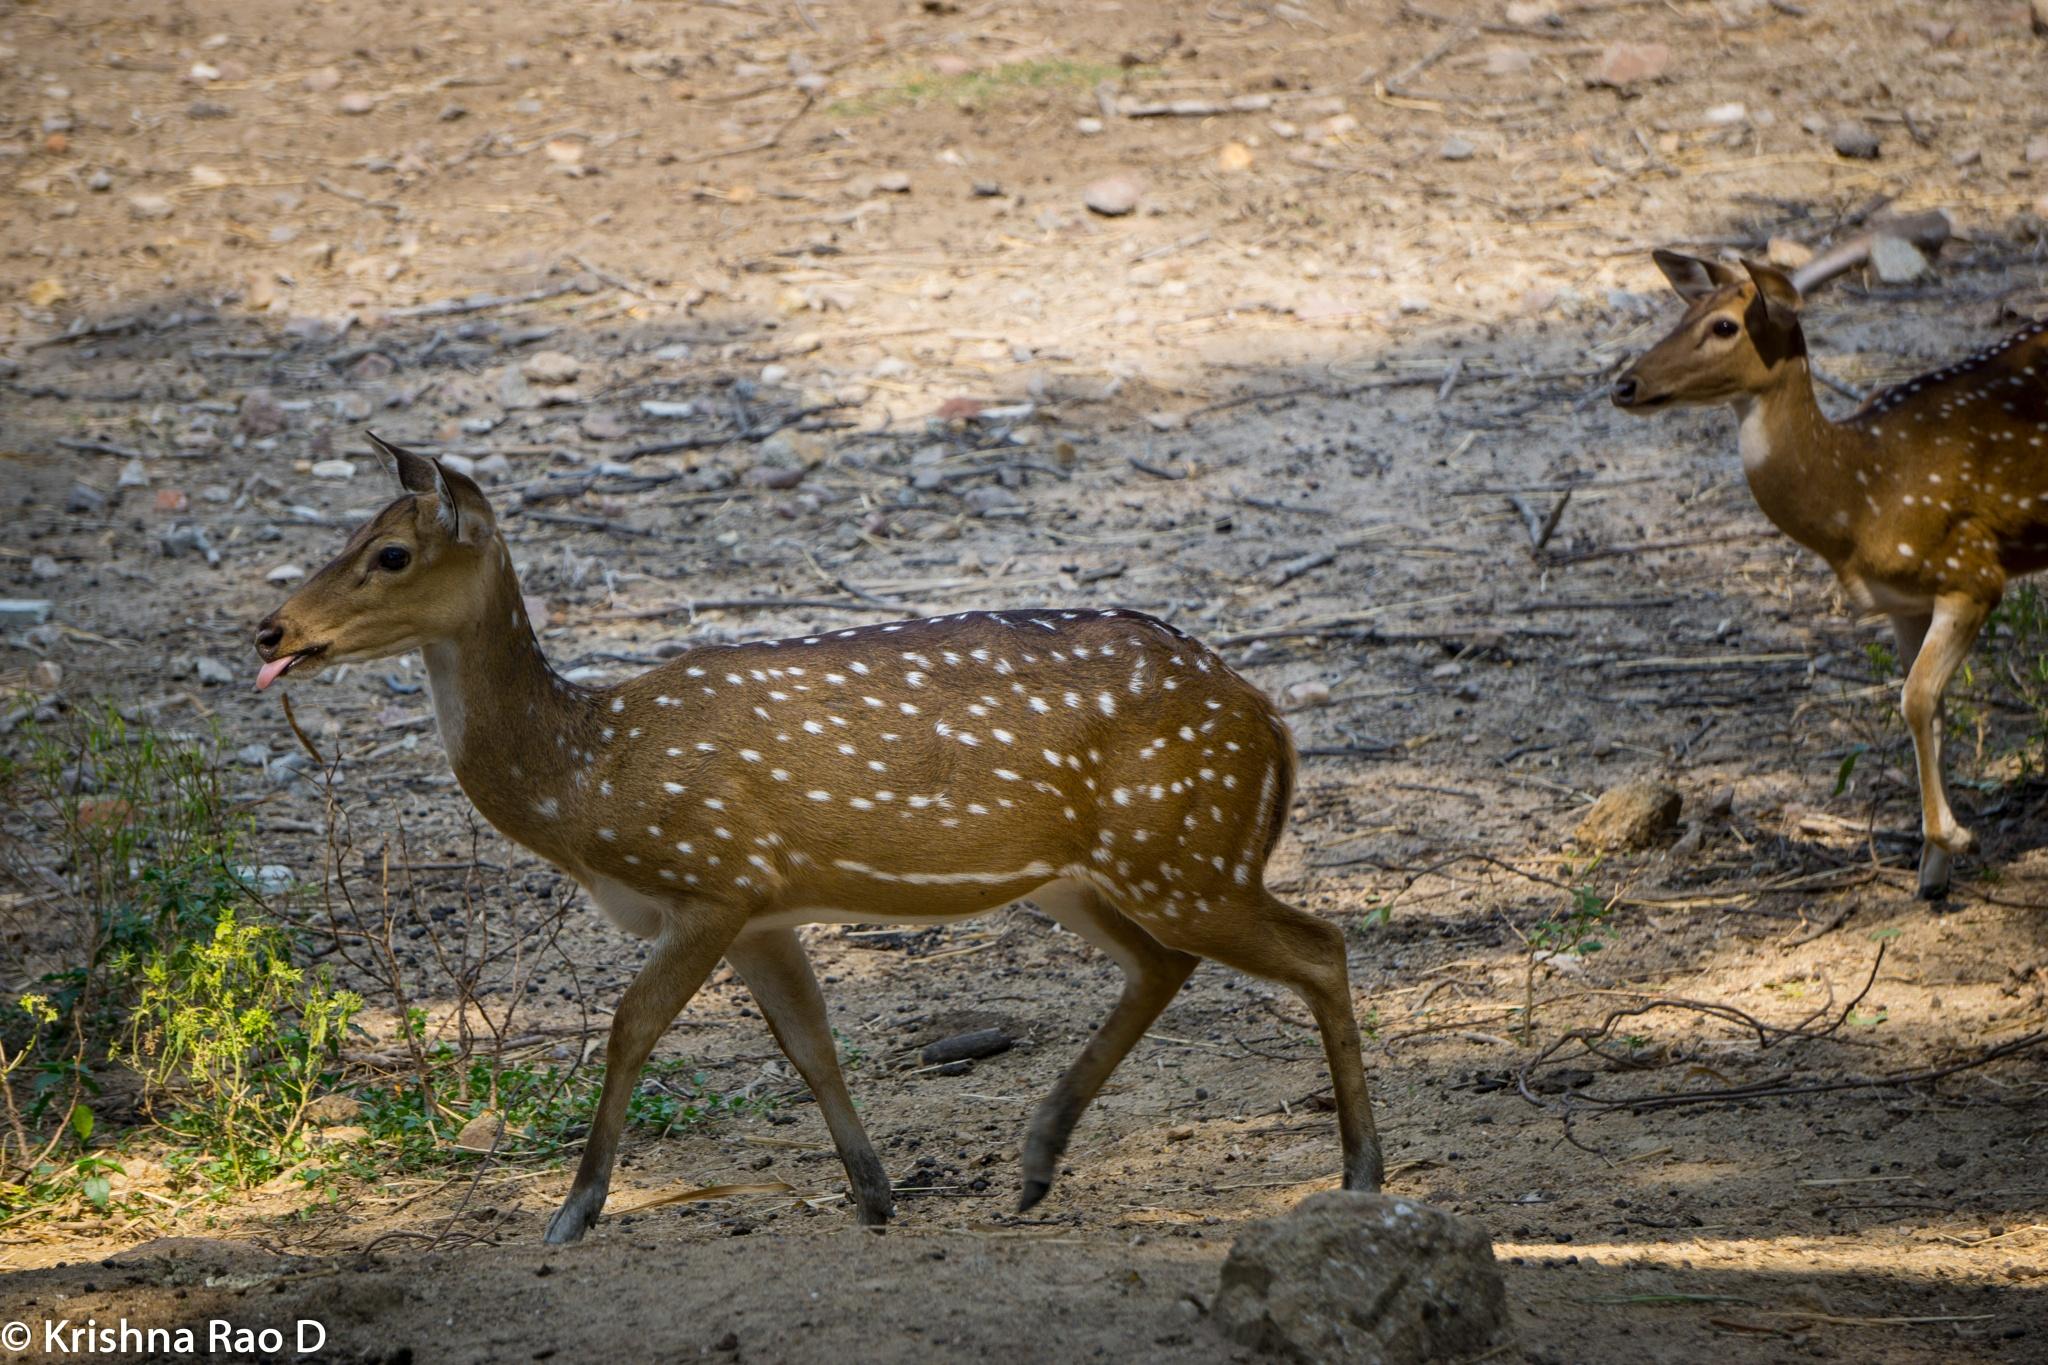 spotted deers by Krishna Rao D